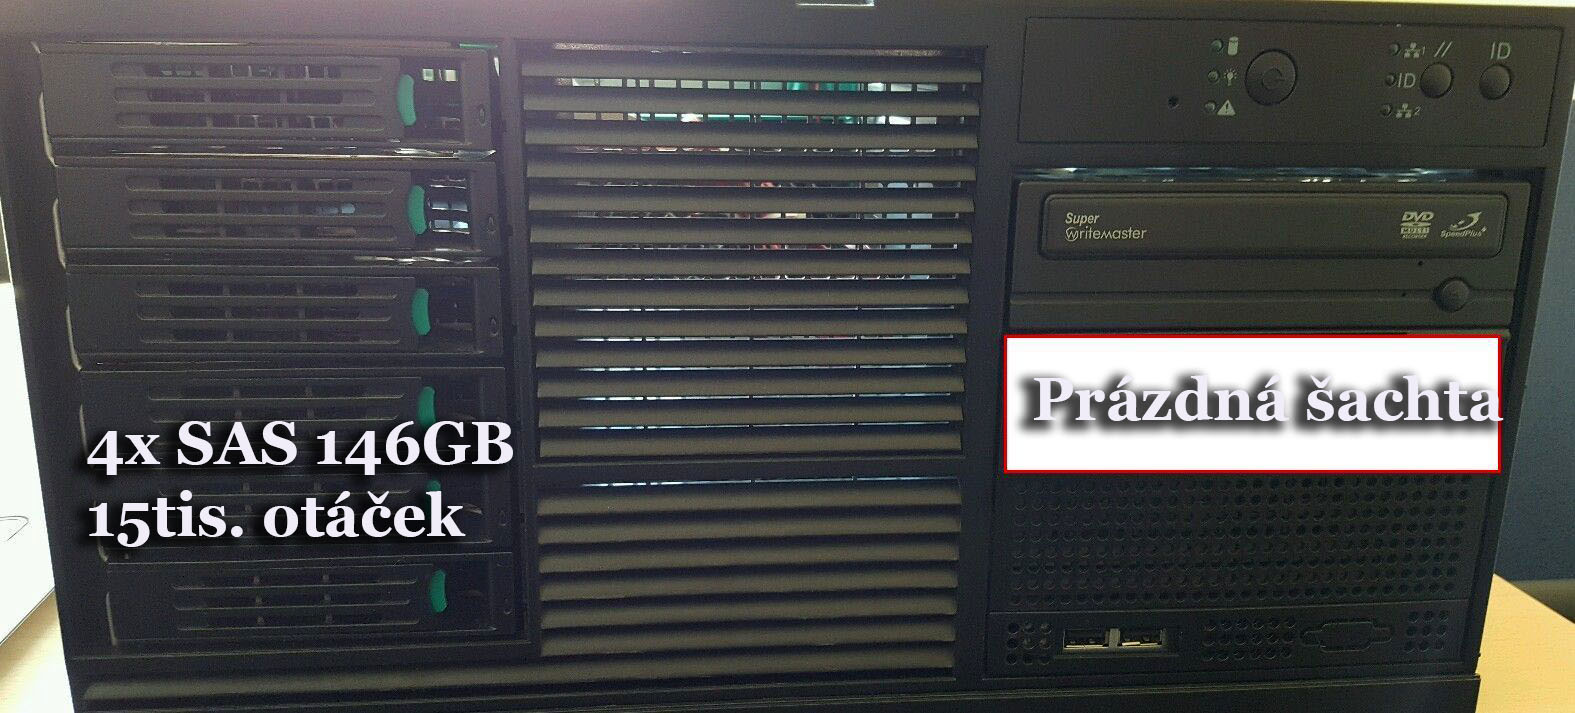 DUAL XEON server / 10GB RAM / 4xSAS